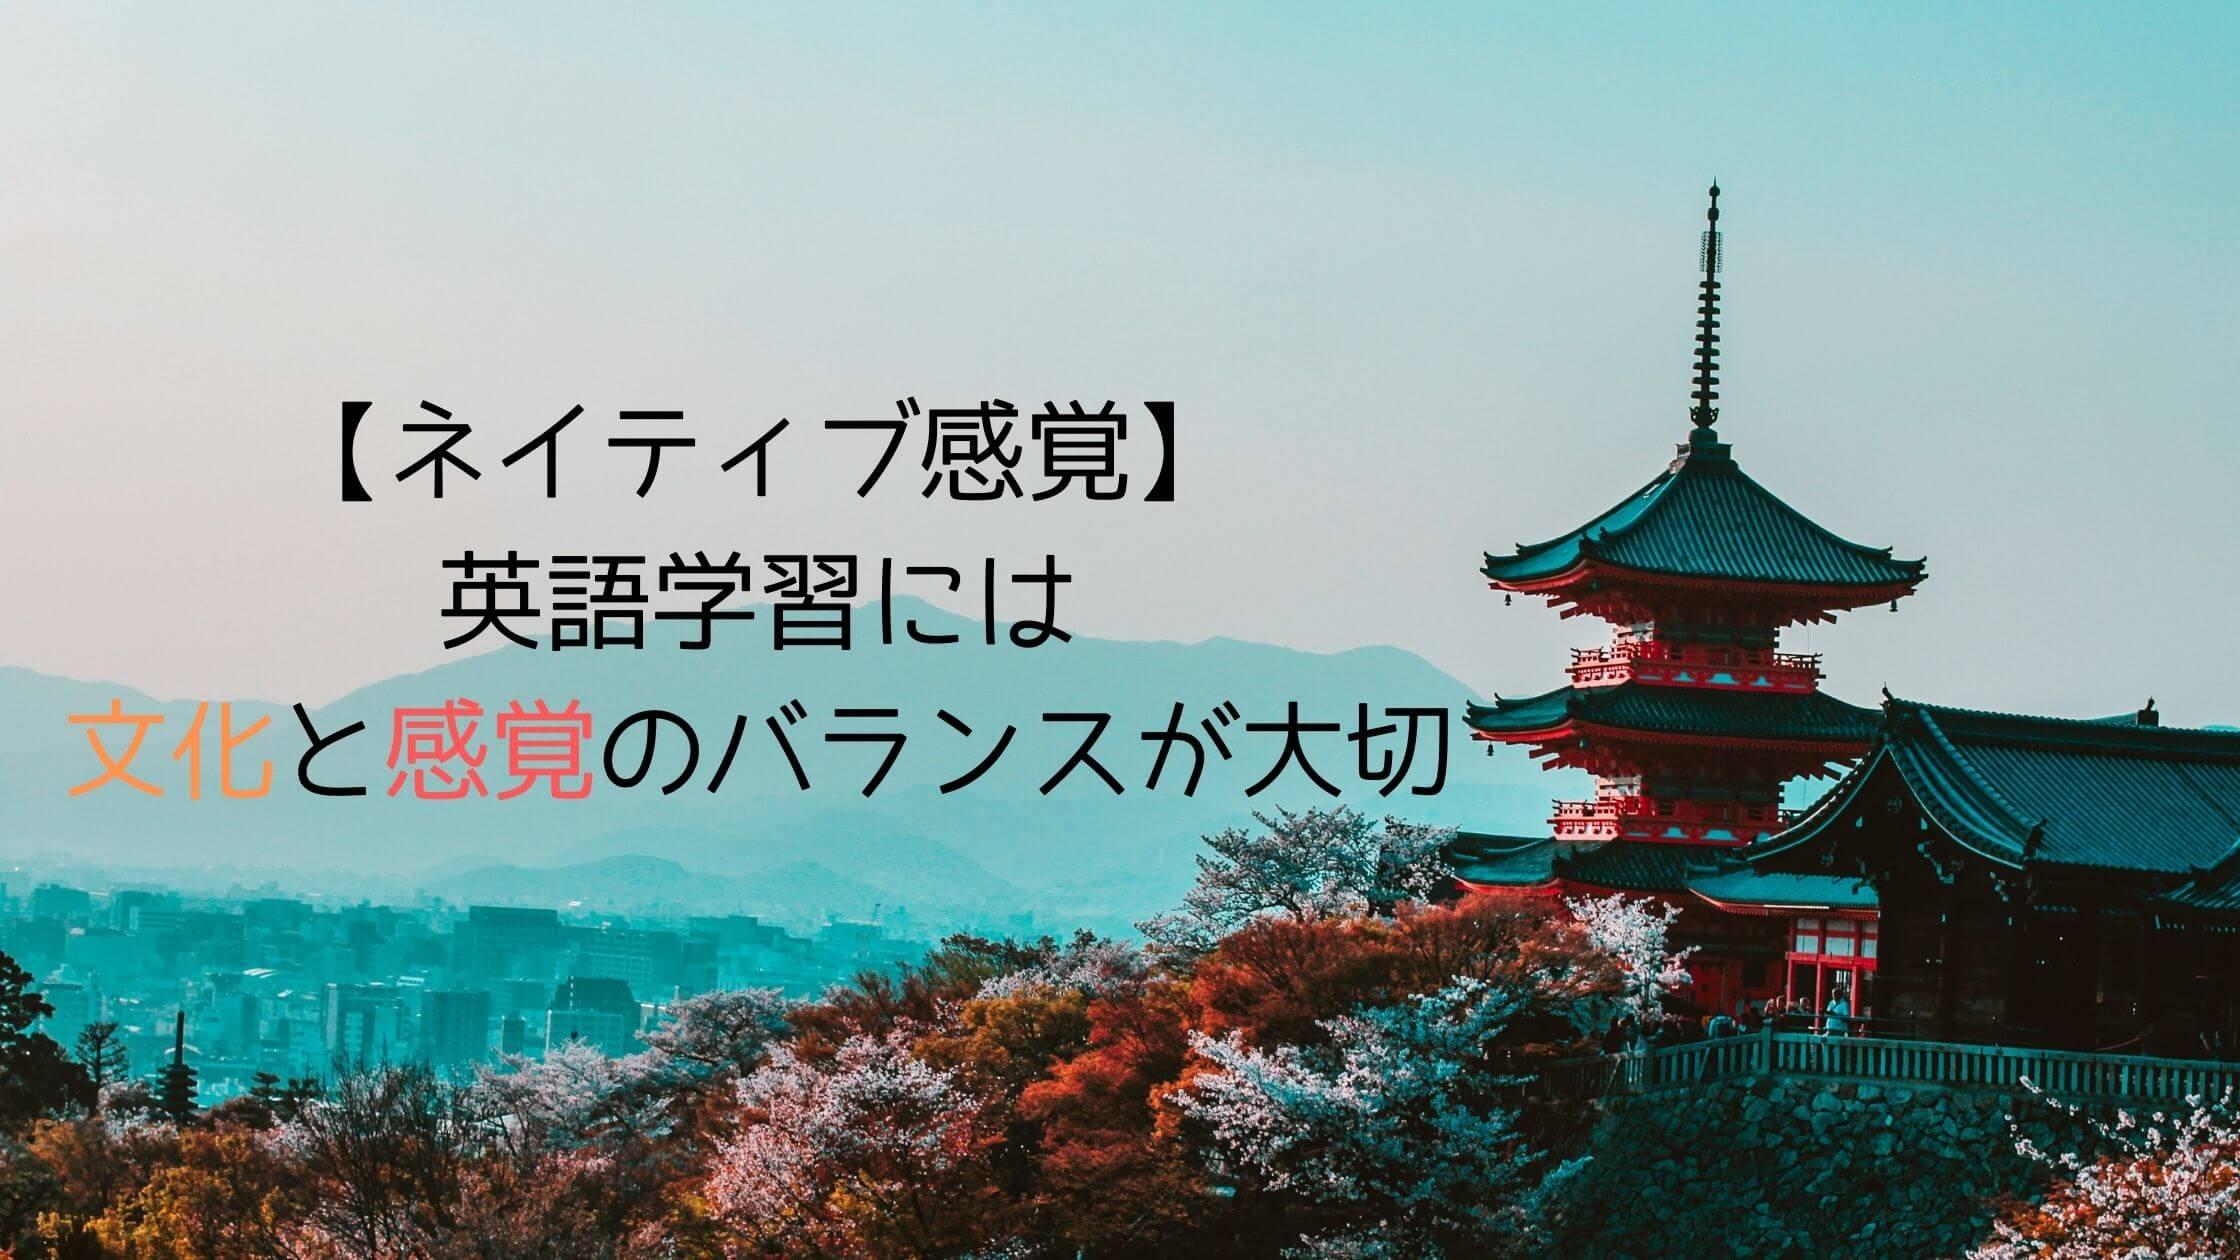 native english / culture